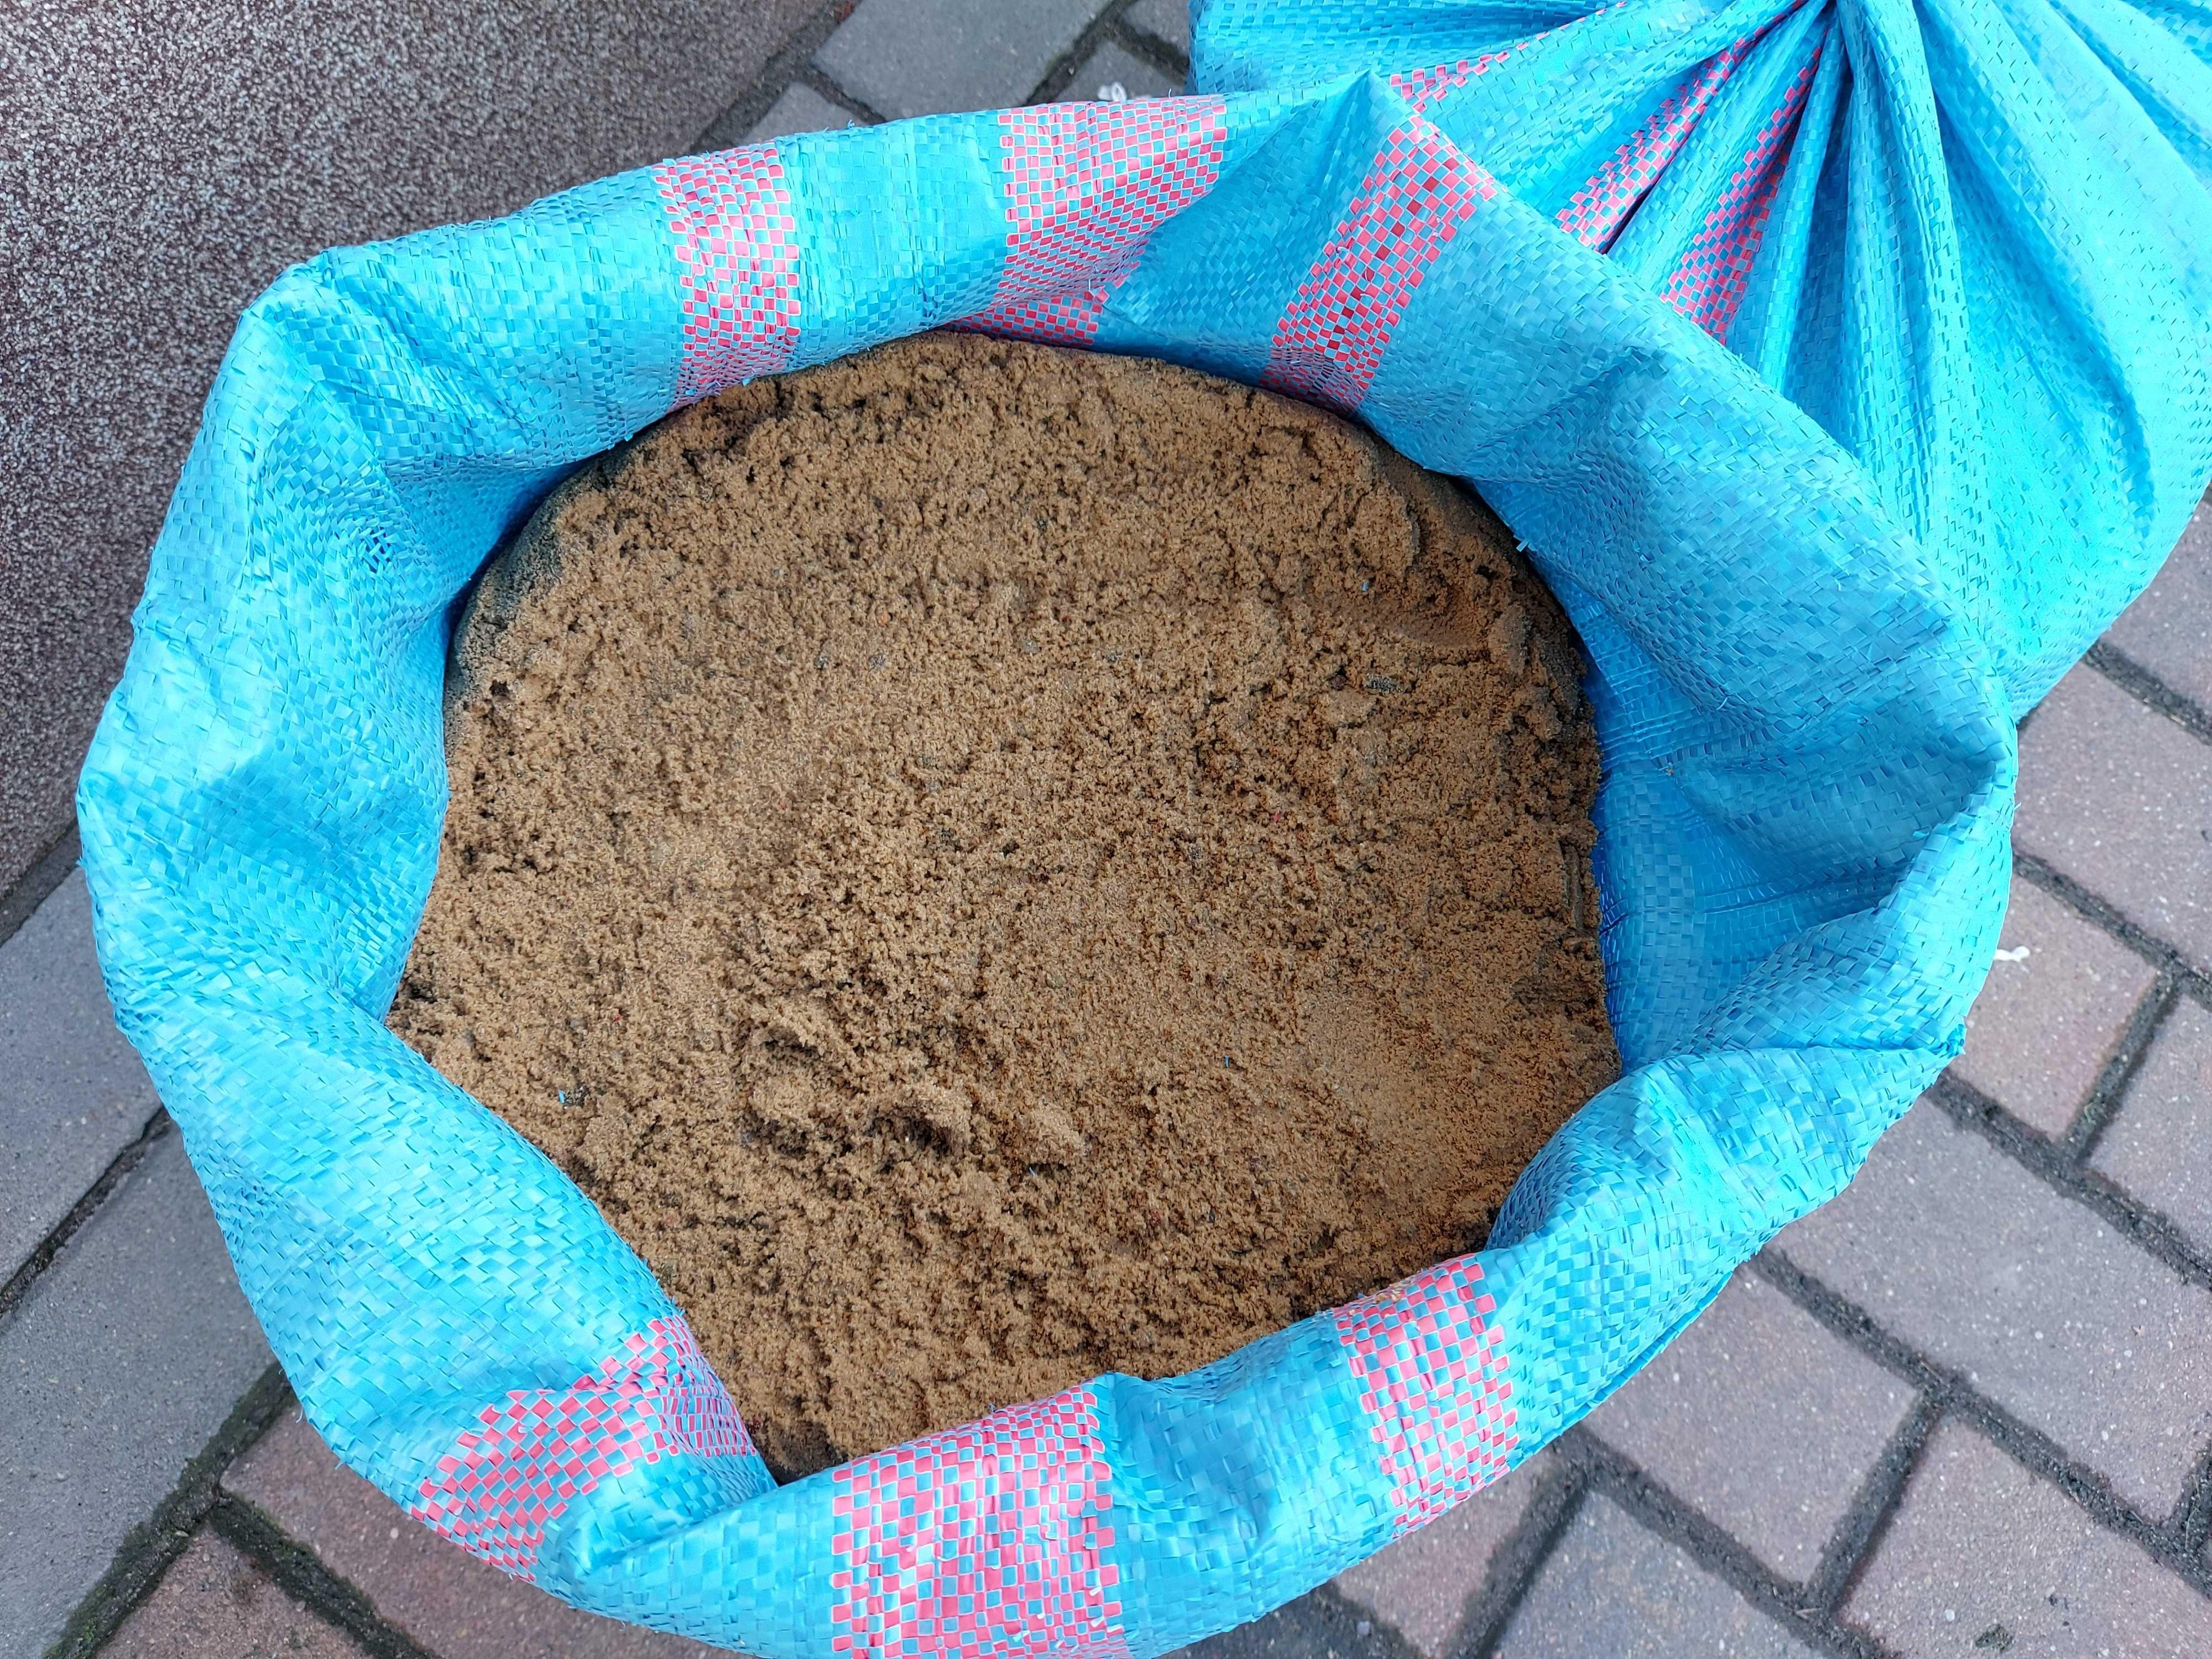 Piasek workowany piasek worki 30kg piasek do piaskownic